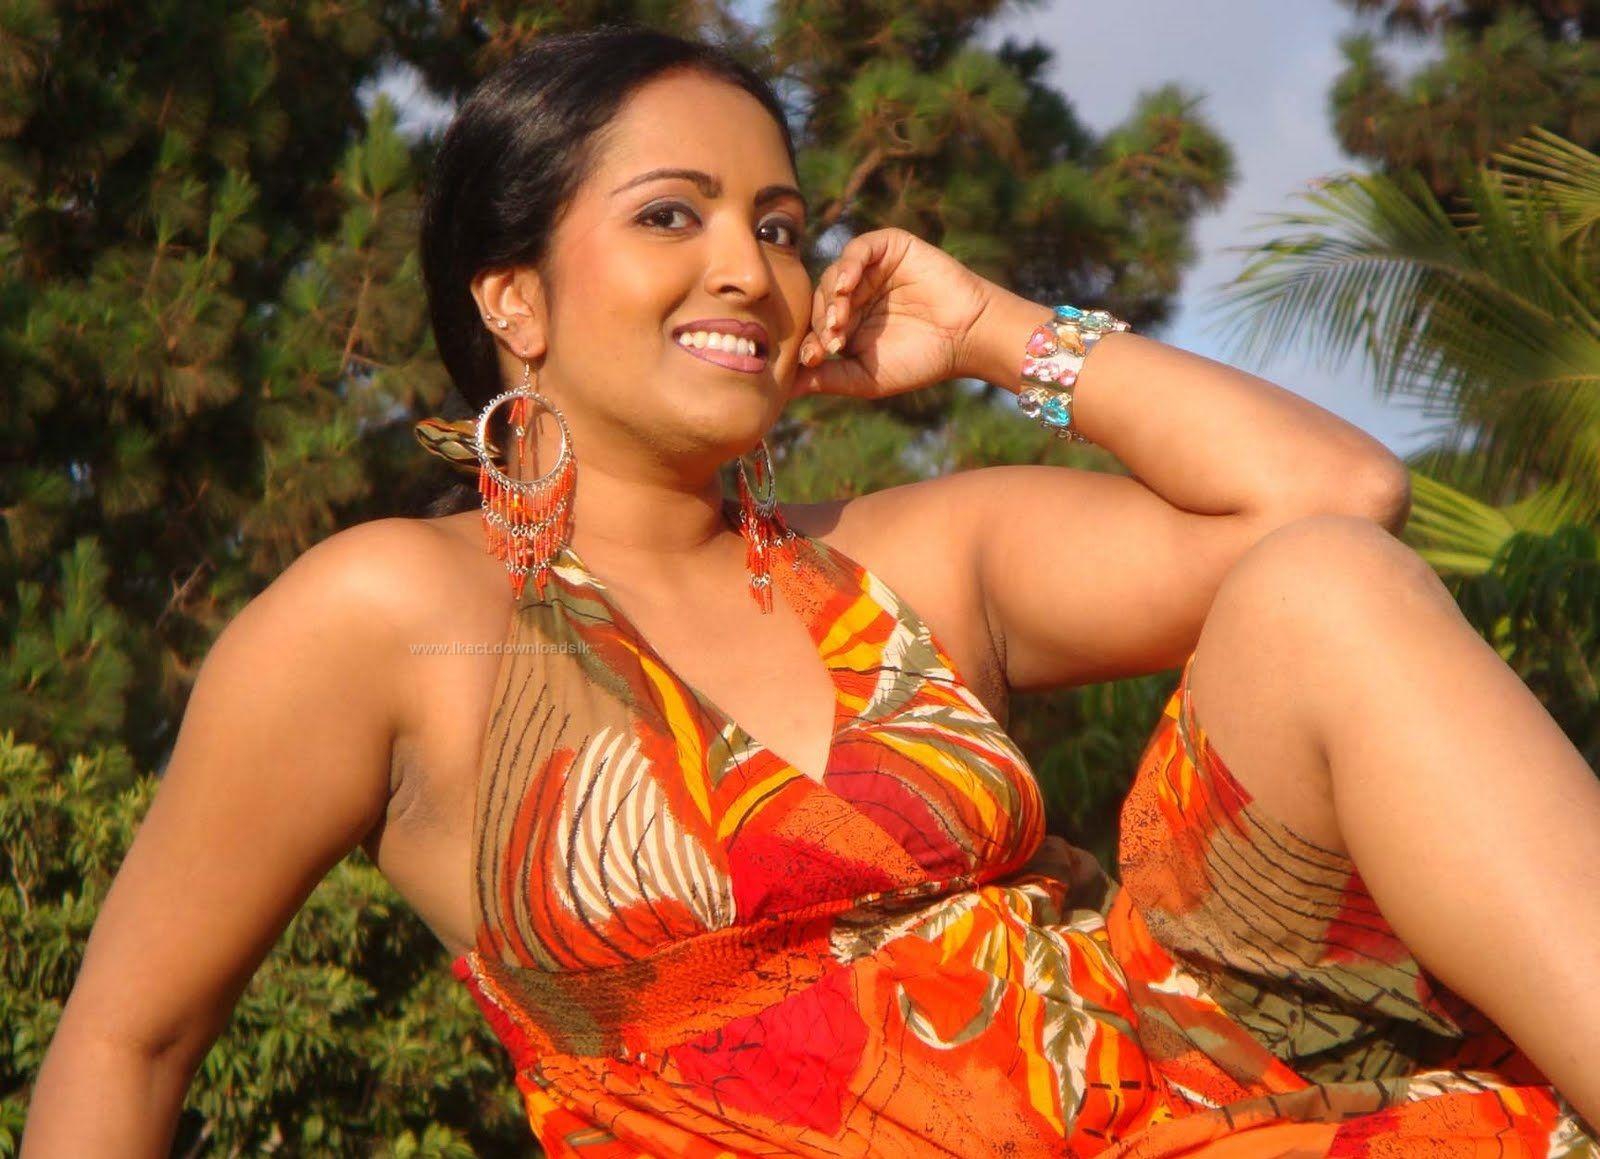 Sri lankan actress boobs. com